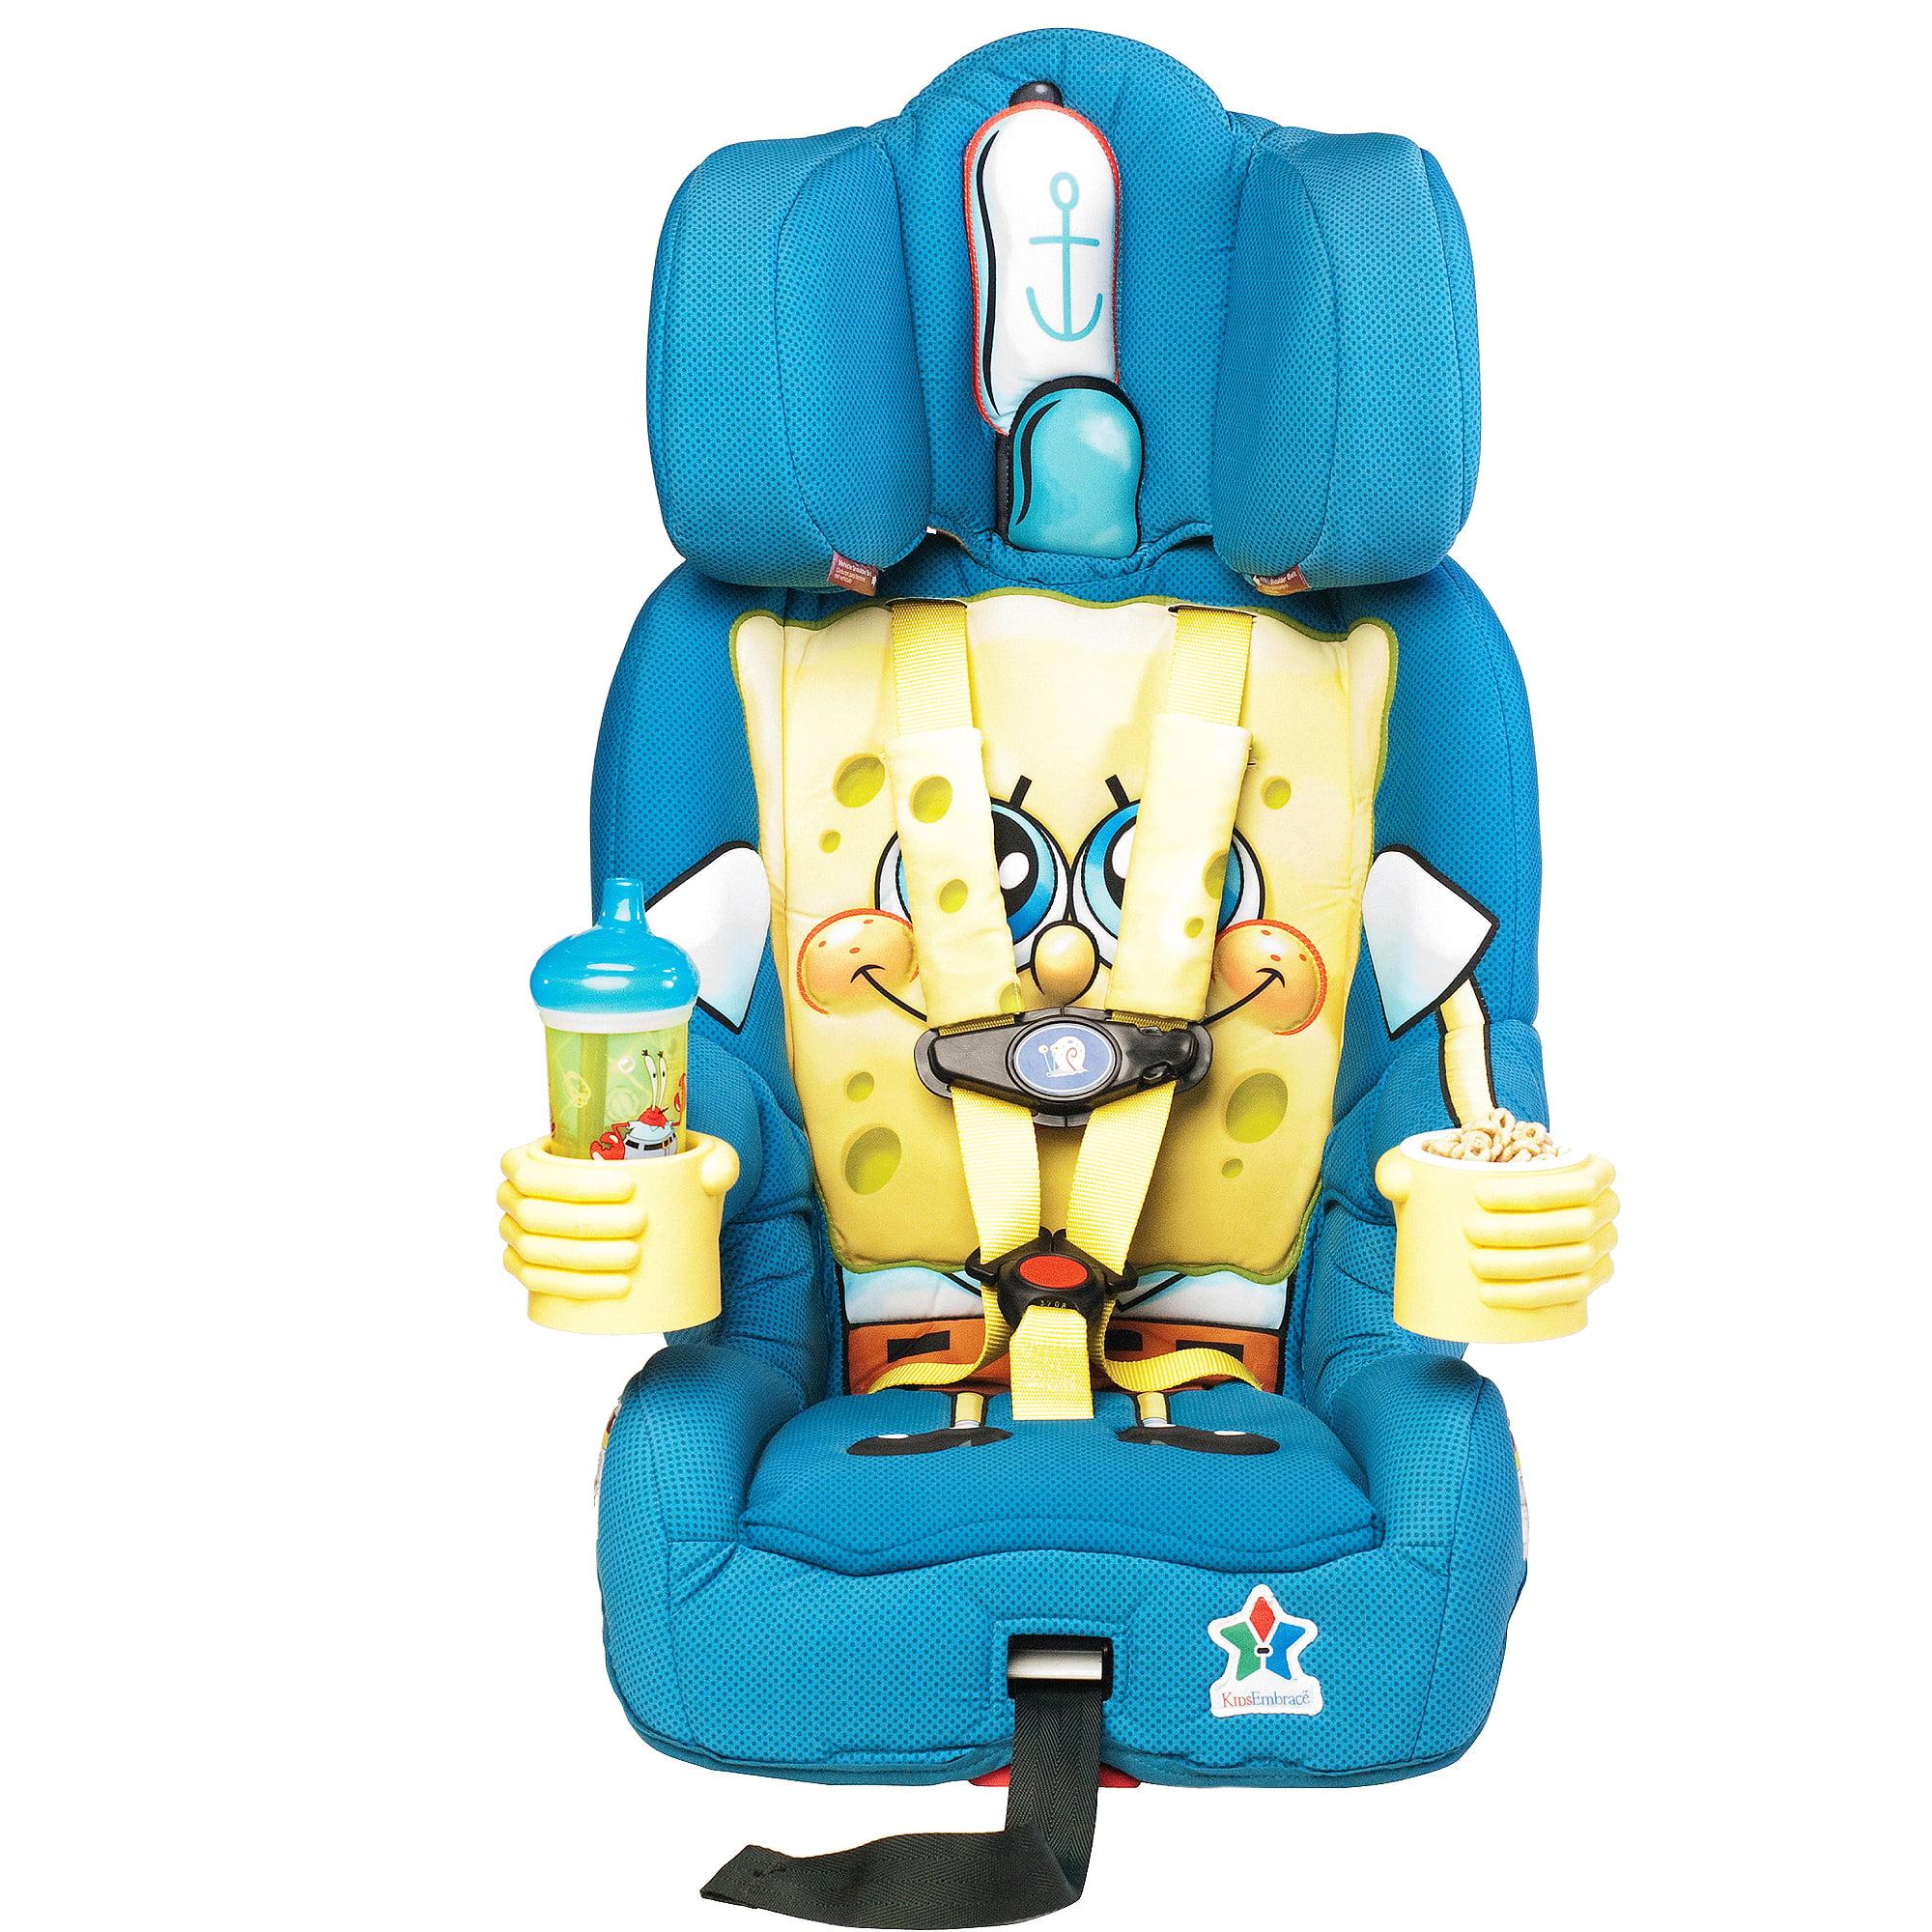 KIDSEmbrace - Booster Car Seat, SpongeBob SquarePants